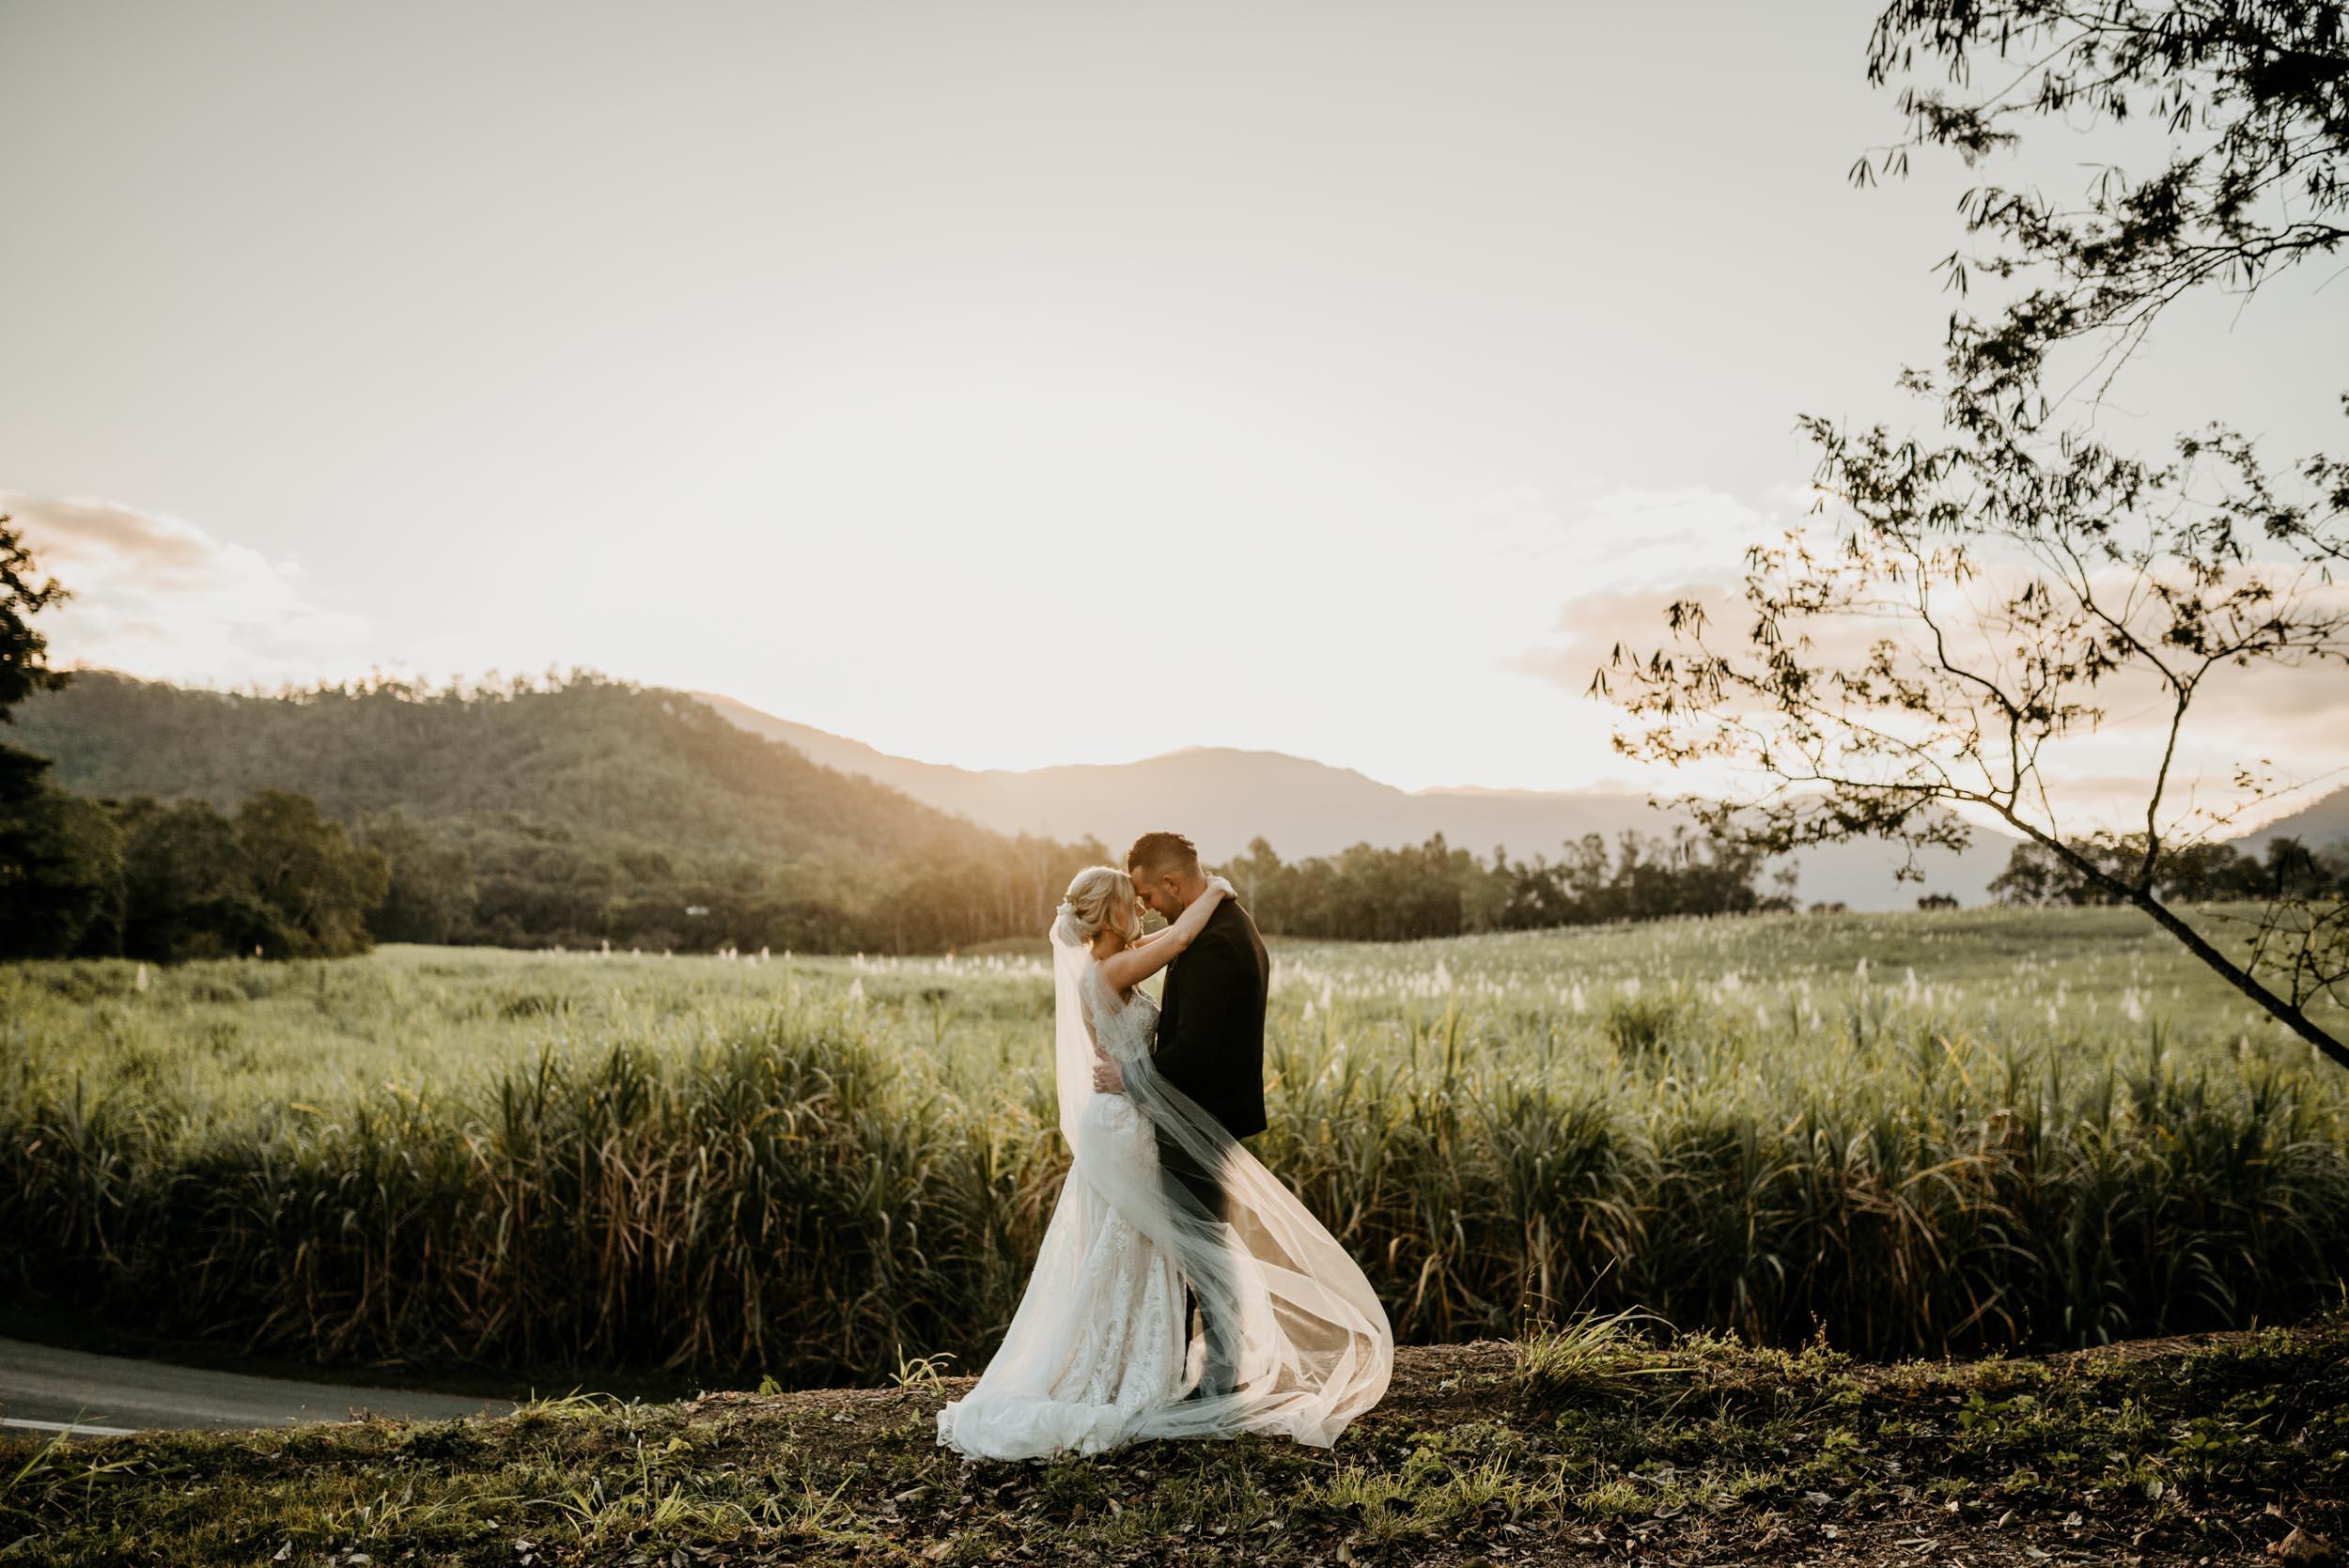 The Raw Photographer - Cairns Wedding Photographer - Laloli - Cairns Garden Wedding - Bride Dress - Destination Wed - Outdoor Reception - Queensland Ceremony-60.jpg